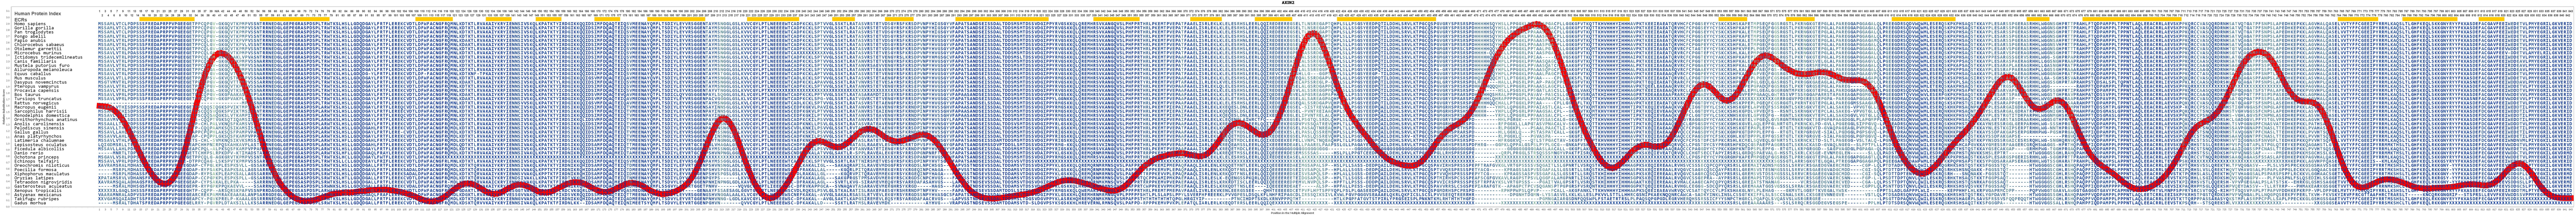 Axin2 Gene Genecards Axin2 Protein Axin2 Antibody